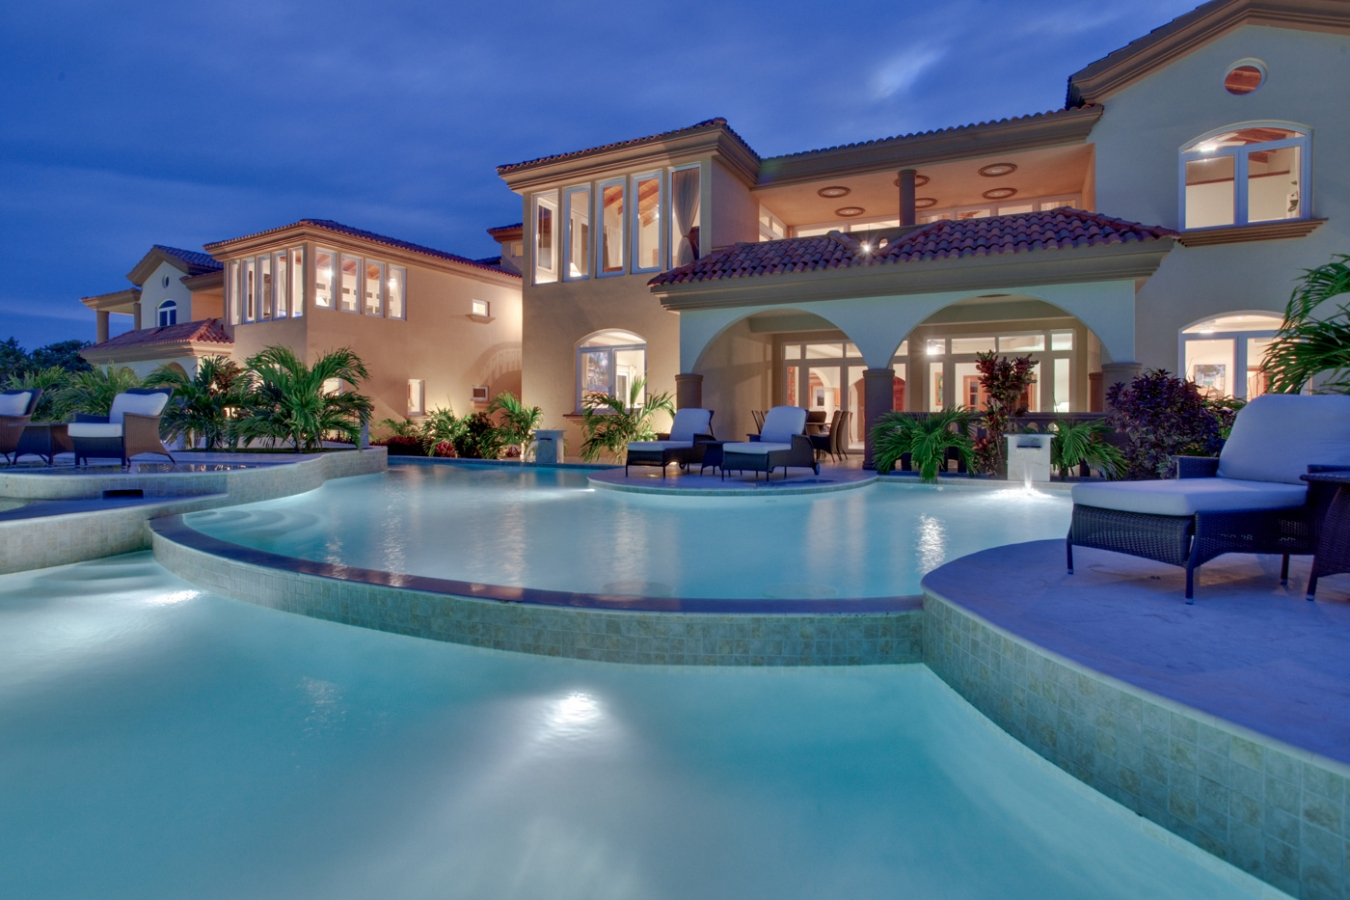 belizean cove estates luxury beachfront vacation rentals in belize